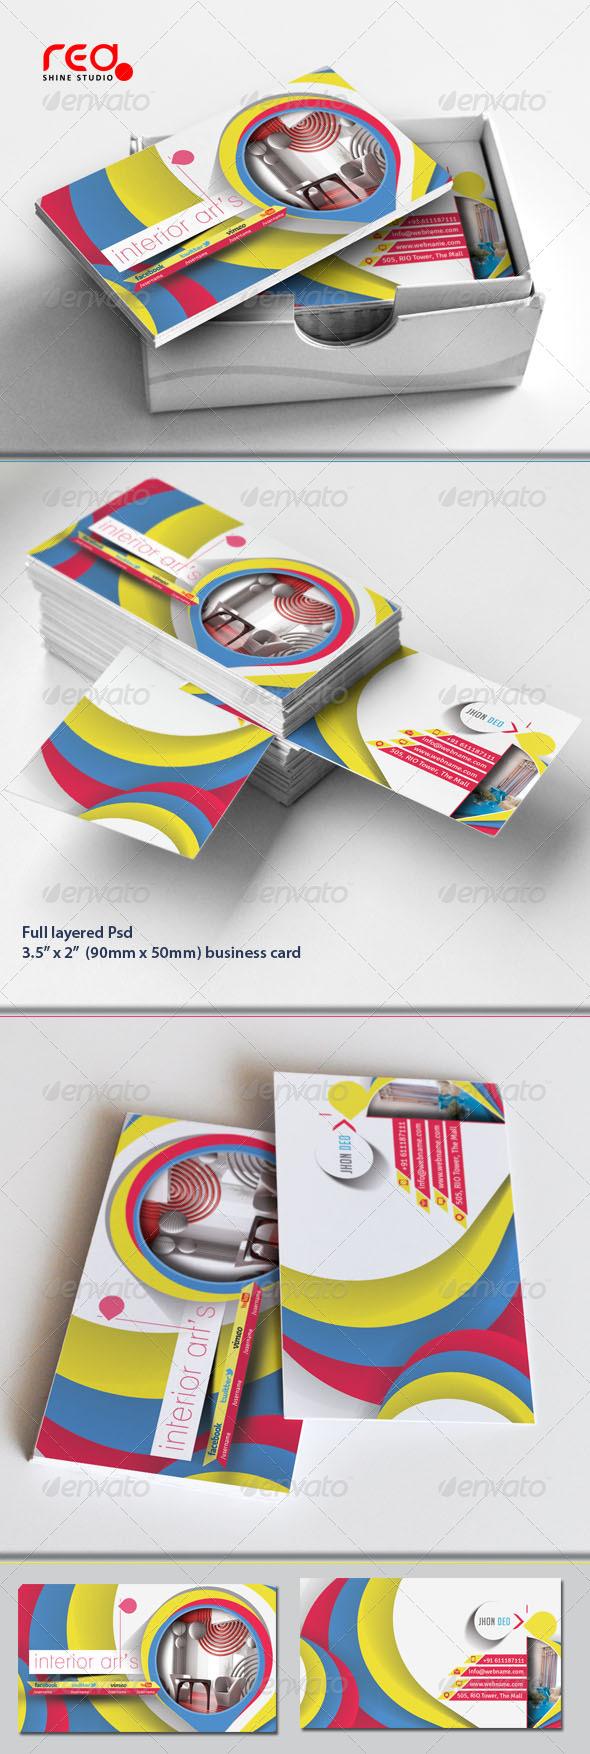 Interior design business card graphics designs templates